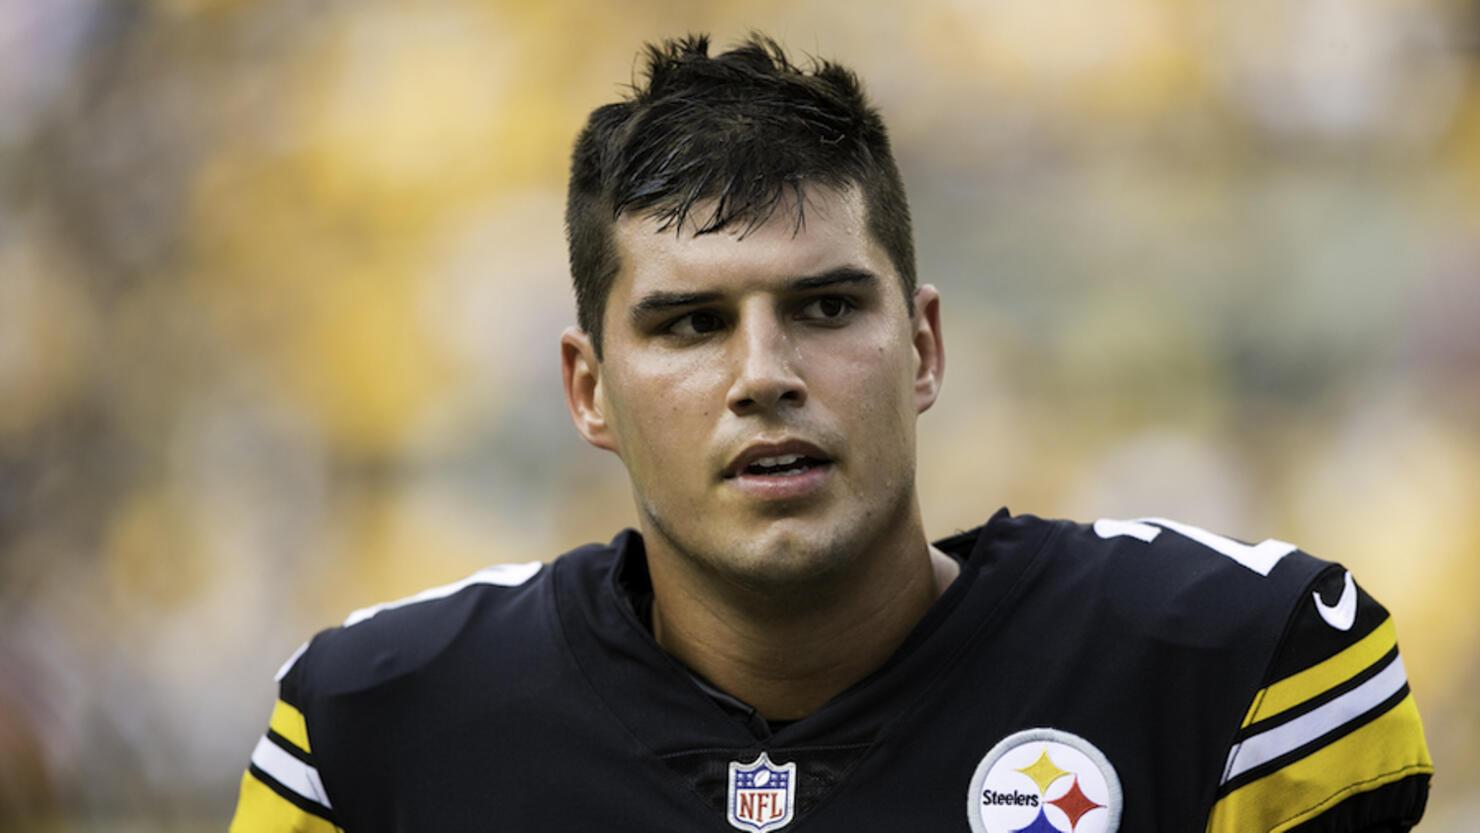 NFL: AUG 25 Preseason - Titans at Steelers